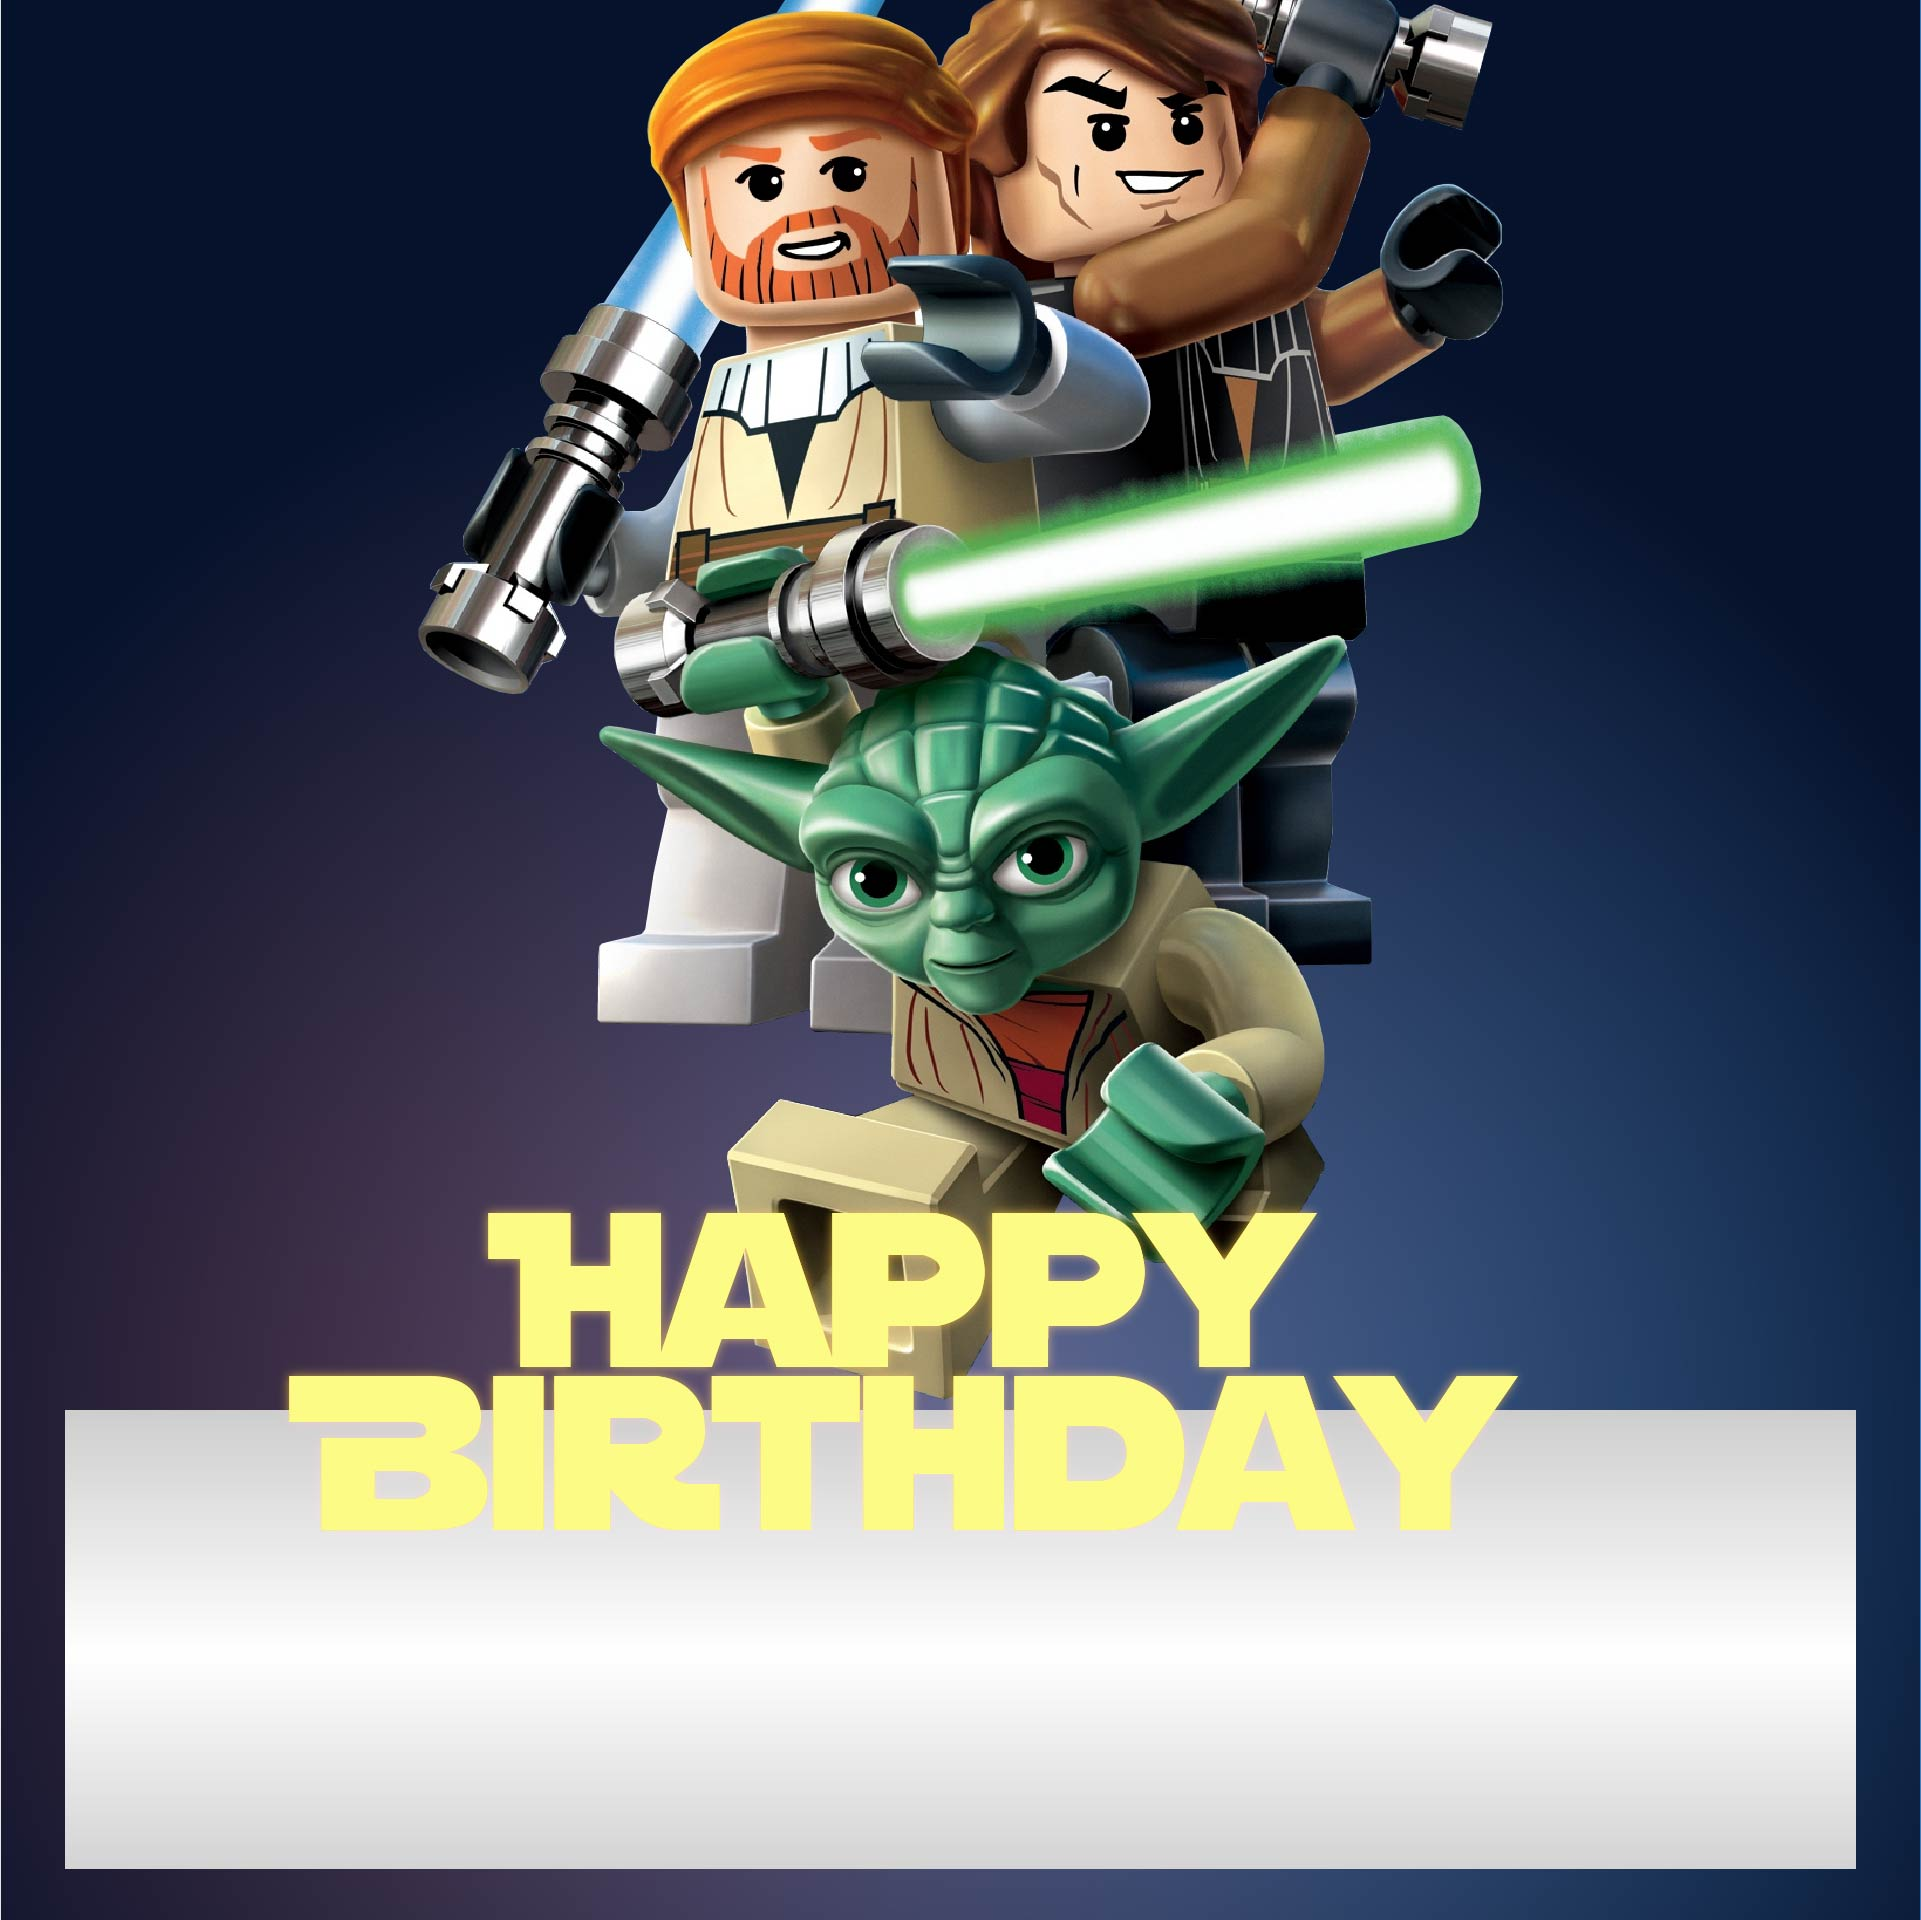 LEGO Star Wars Birthday Card Printable Free